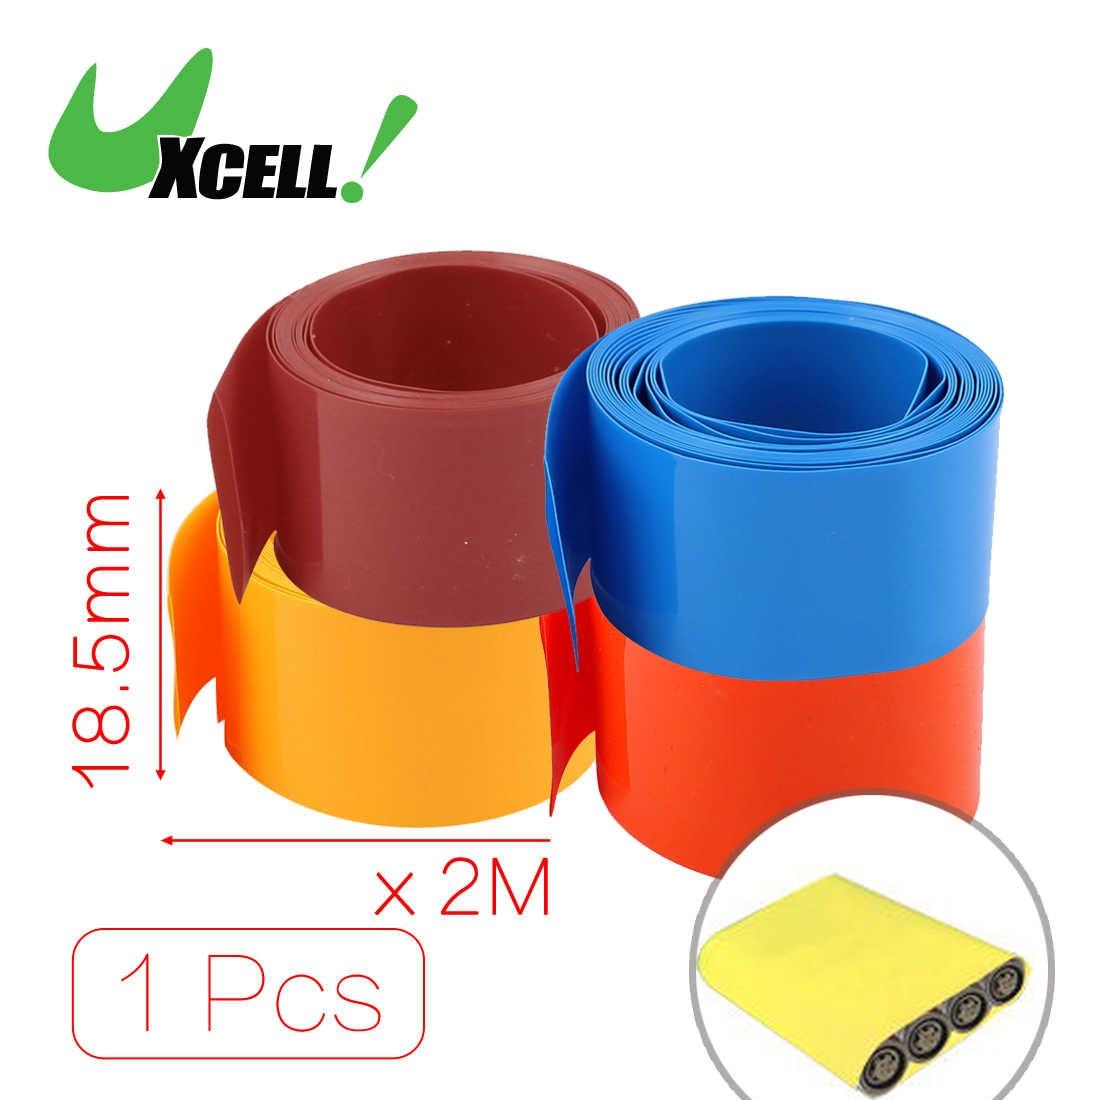 Uxcell 18.5Mm Diameter 2M Length Pvc Heat Shrink Tube Tubing Battery Wrap Clear .bluecleargreenorangeredwhite